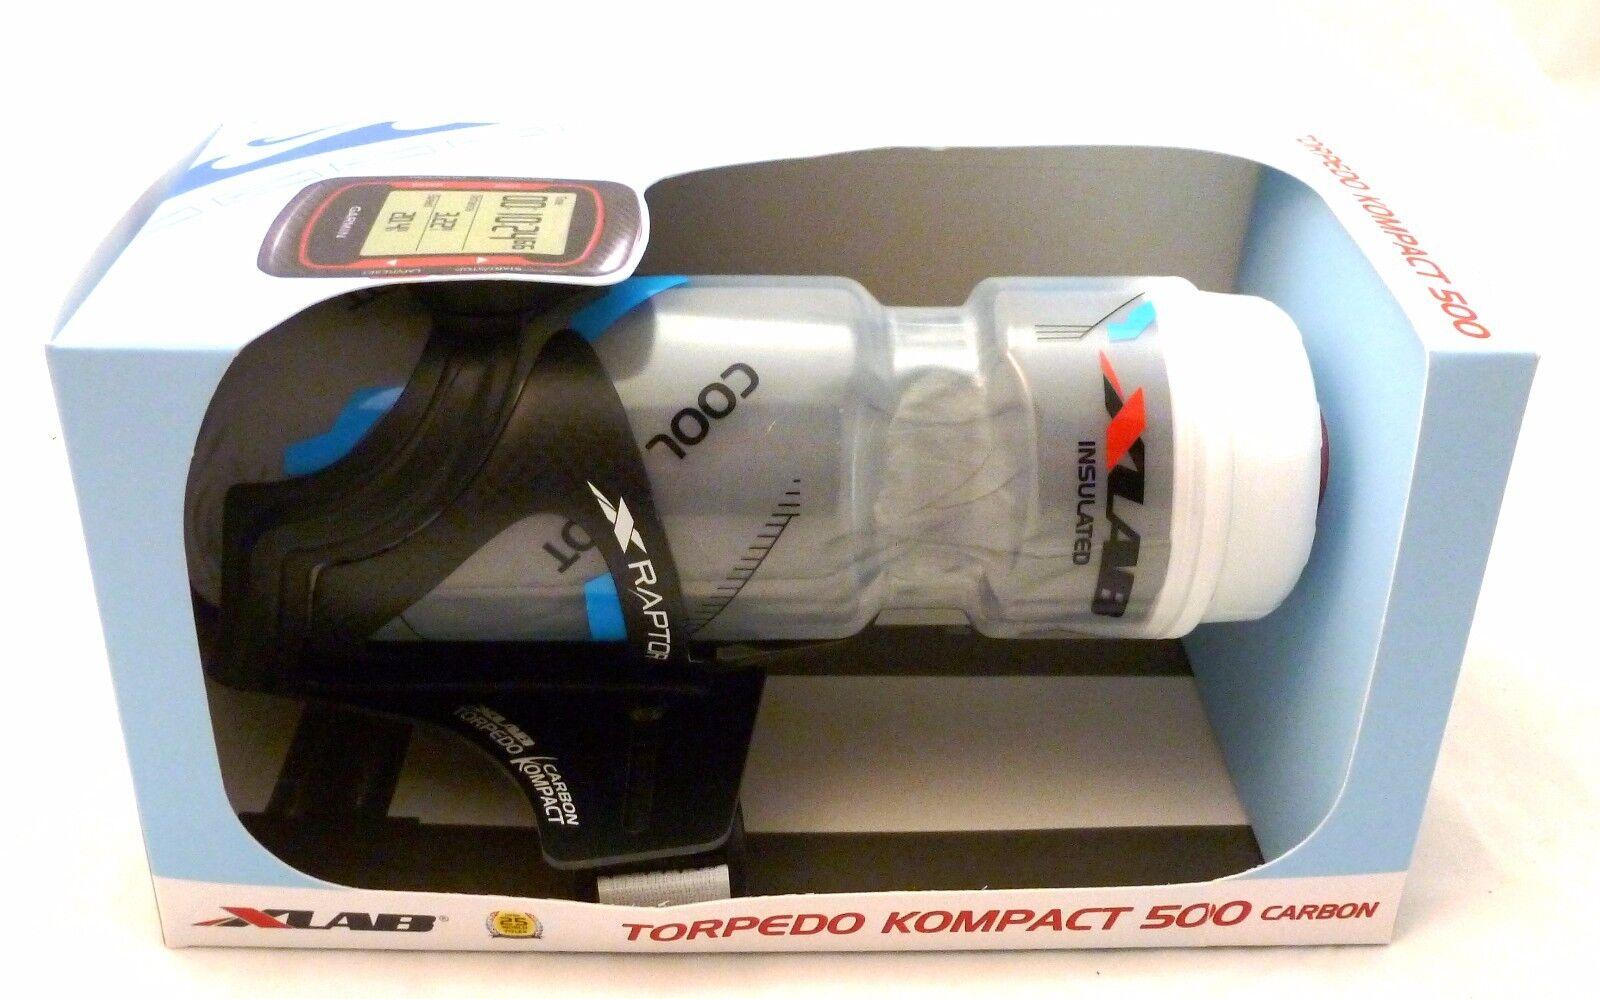 X-Lab Torpedo Kompact 500  Carbon with Computer Mount xlab  trendy